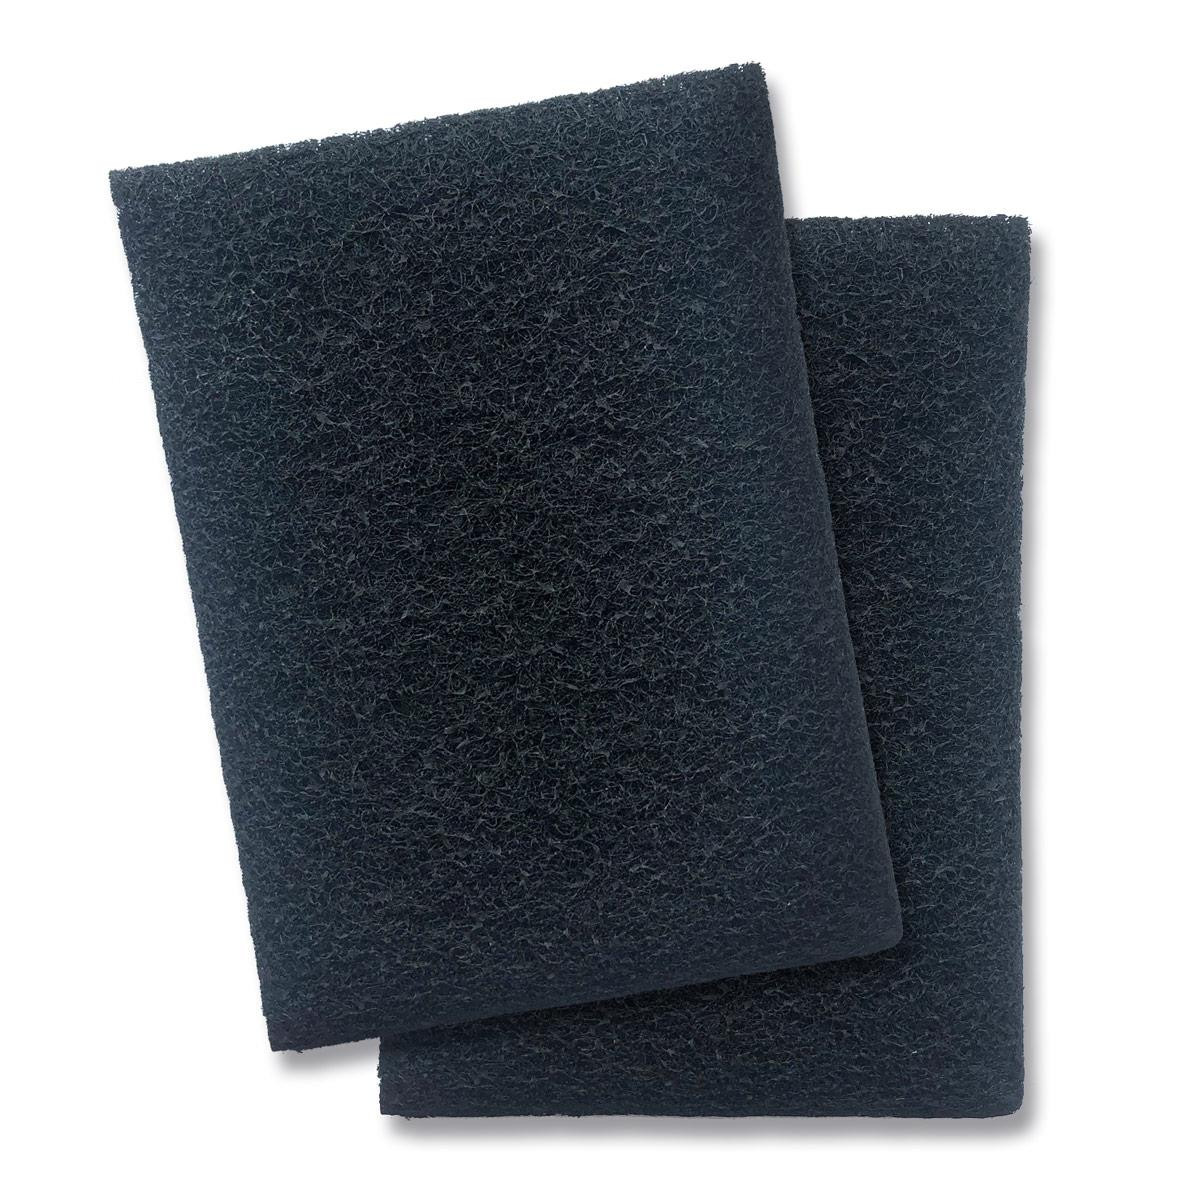 Joseph Joseph 2 Pack Replacement Odour Filters